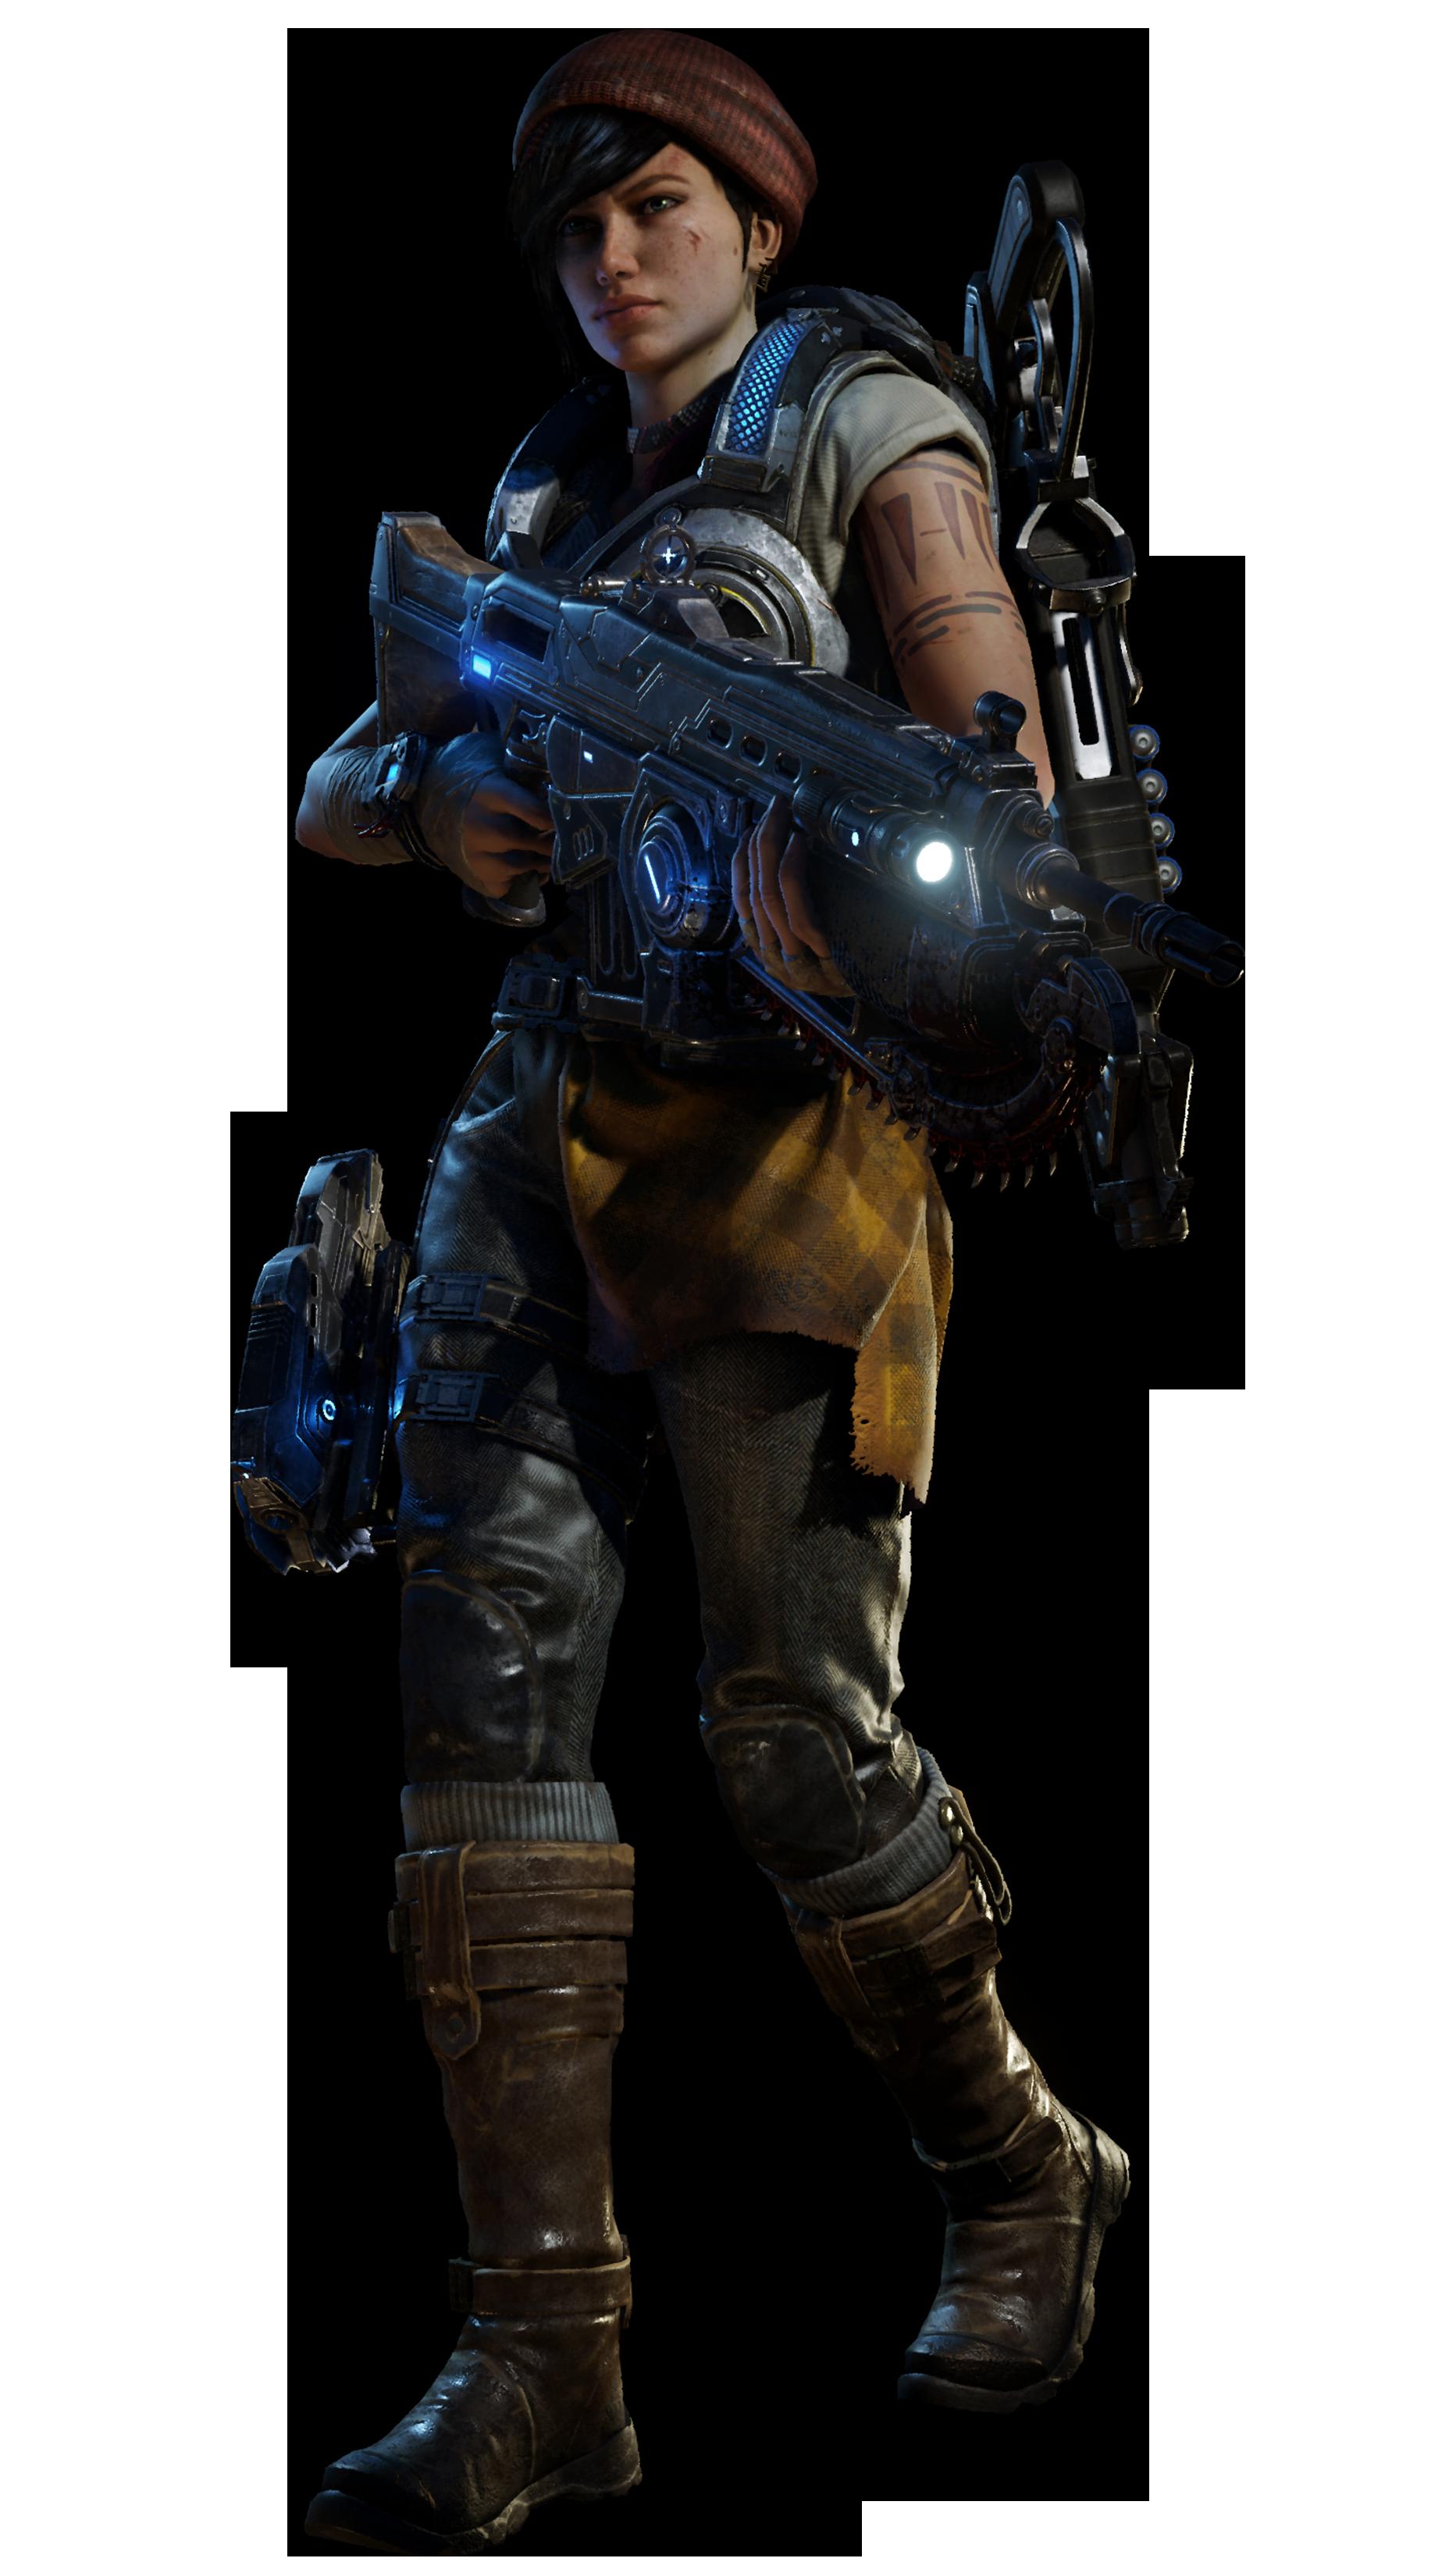 Gears Of War HD PNG - 92142